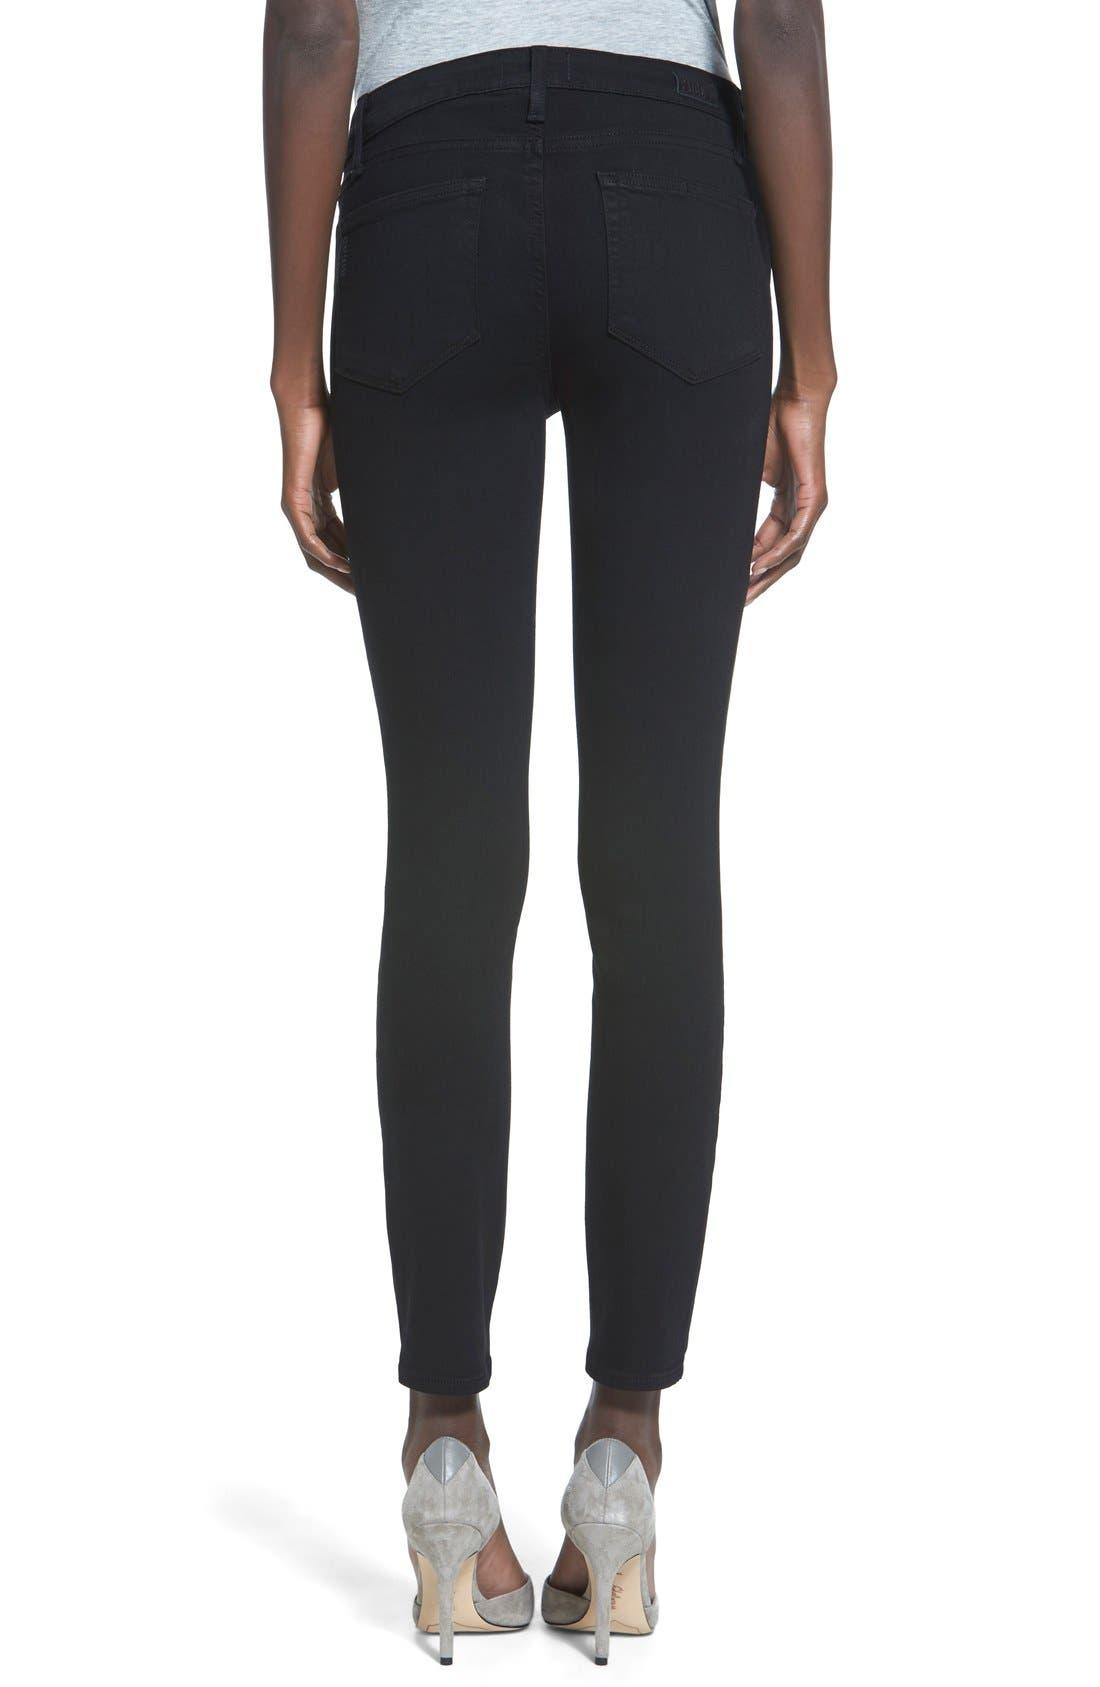 Alternate Image 2  - PAIGE 'Transcend - Verdugo' Ankle Ultra Skinny Jeans (Black Shadow)